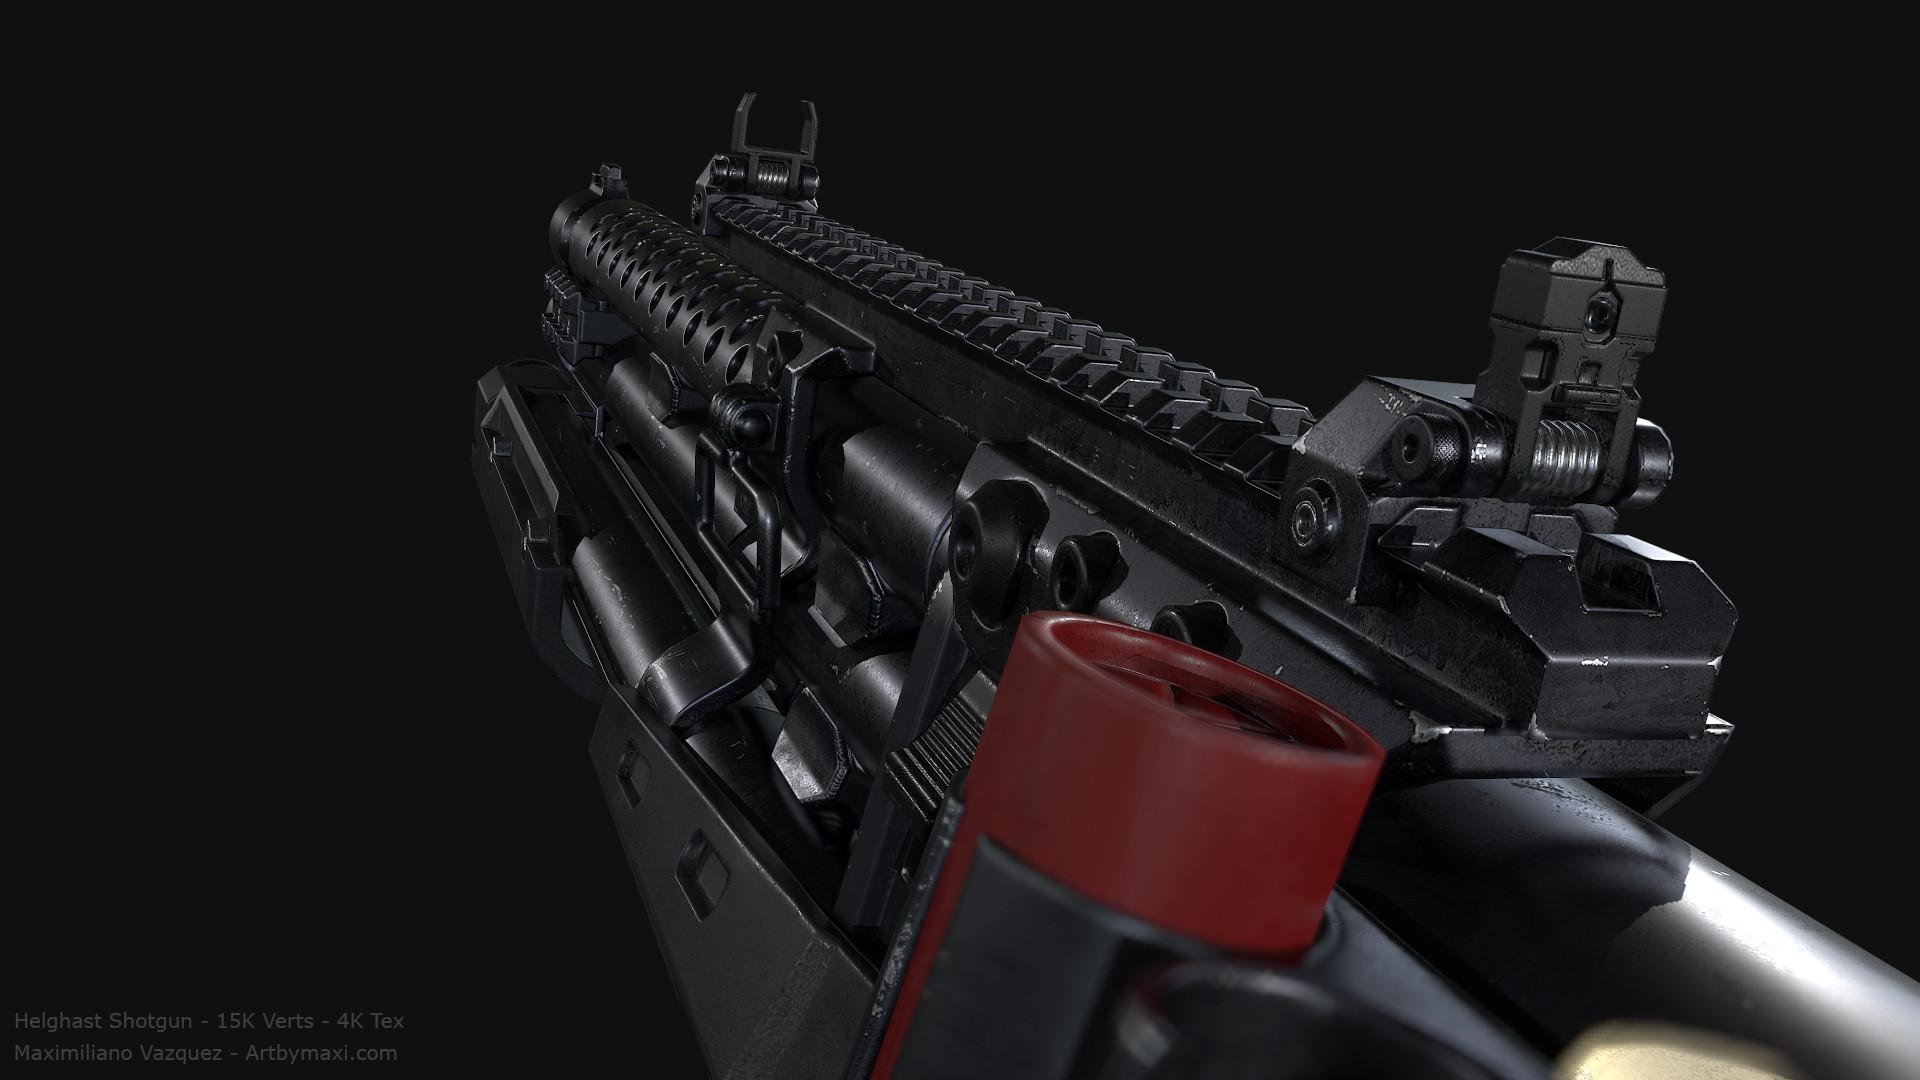 Maximiliano vazquez hellghast shotgun lp8